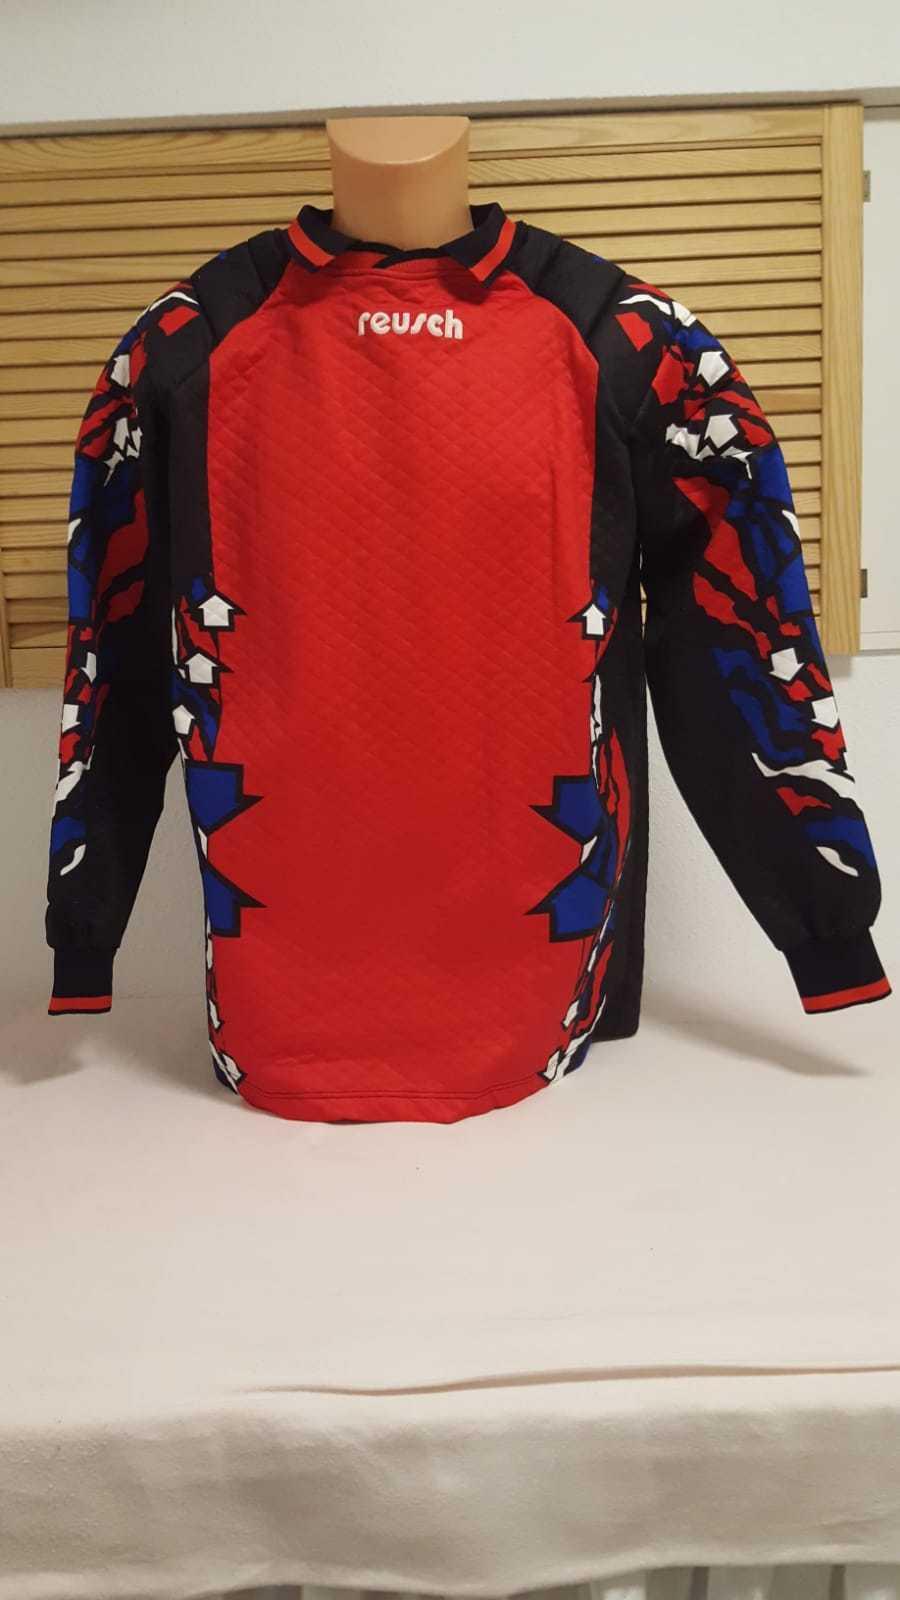 Reusch Vintage Retro Torwart Trikot Shirt Jersey Maglia Camiseta Goalkeeper XL    Modernes Design